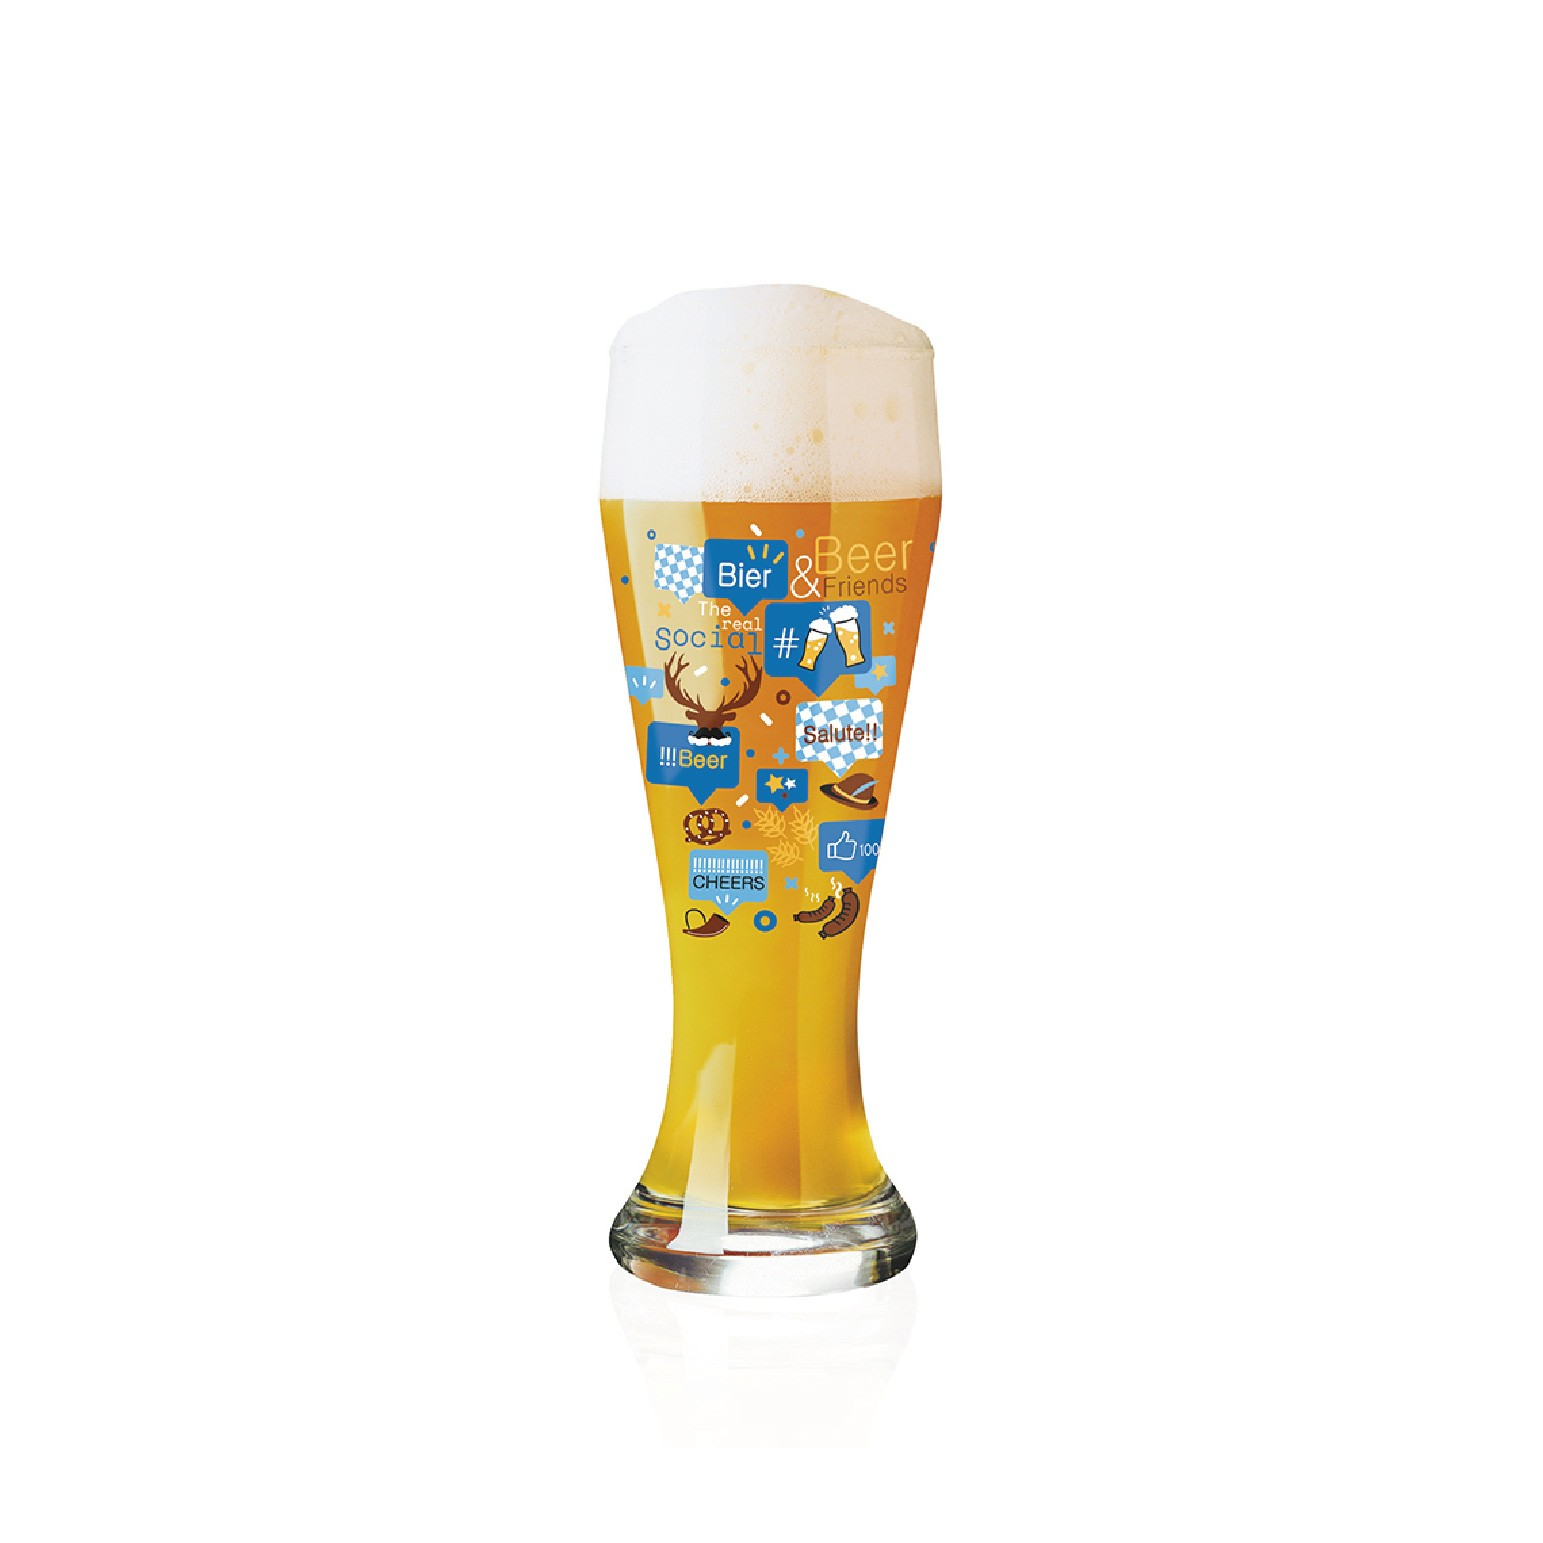 RITZENHOFF 小麥胖胖啤酒杯 / WEIZEN